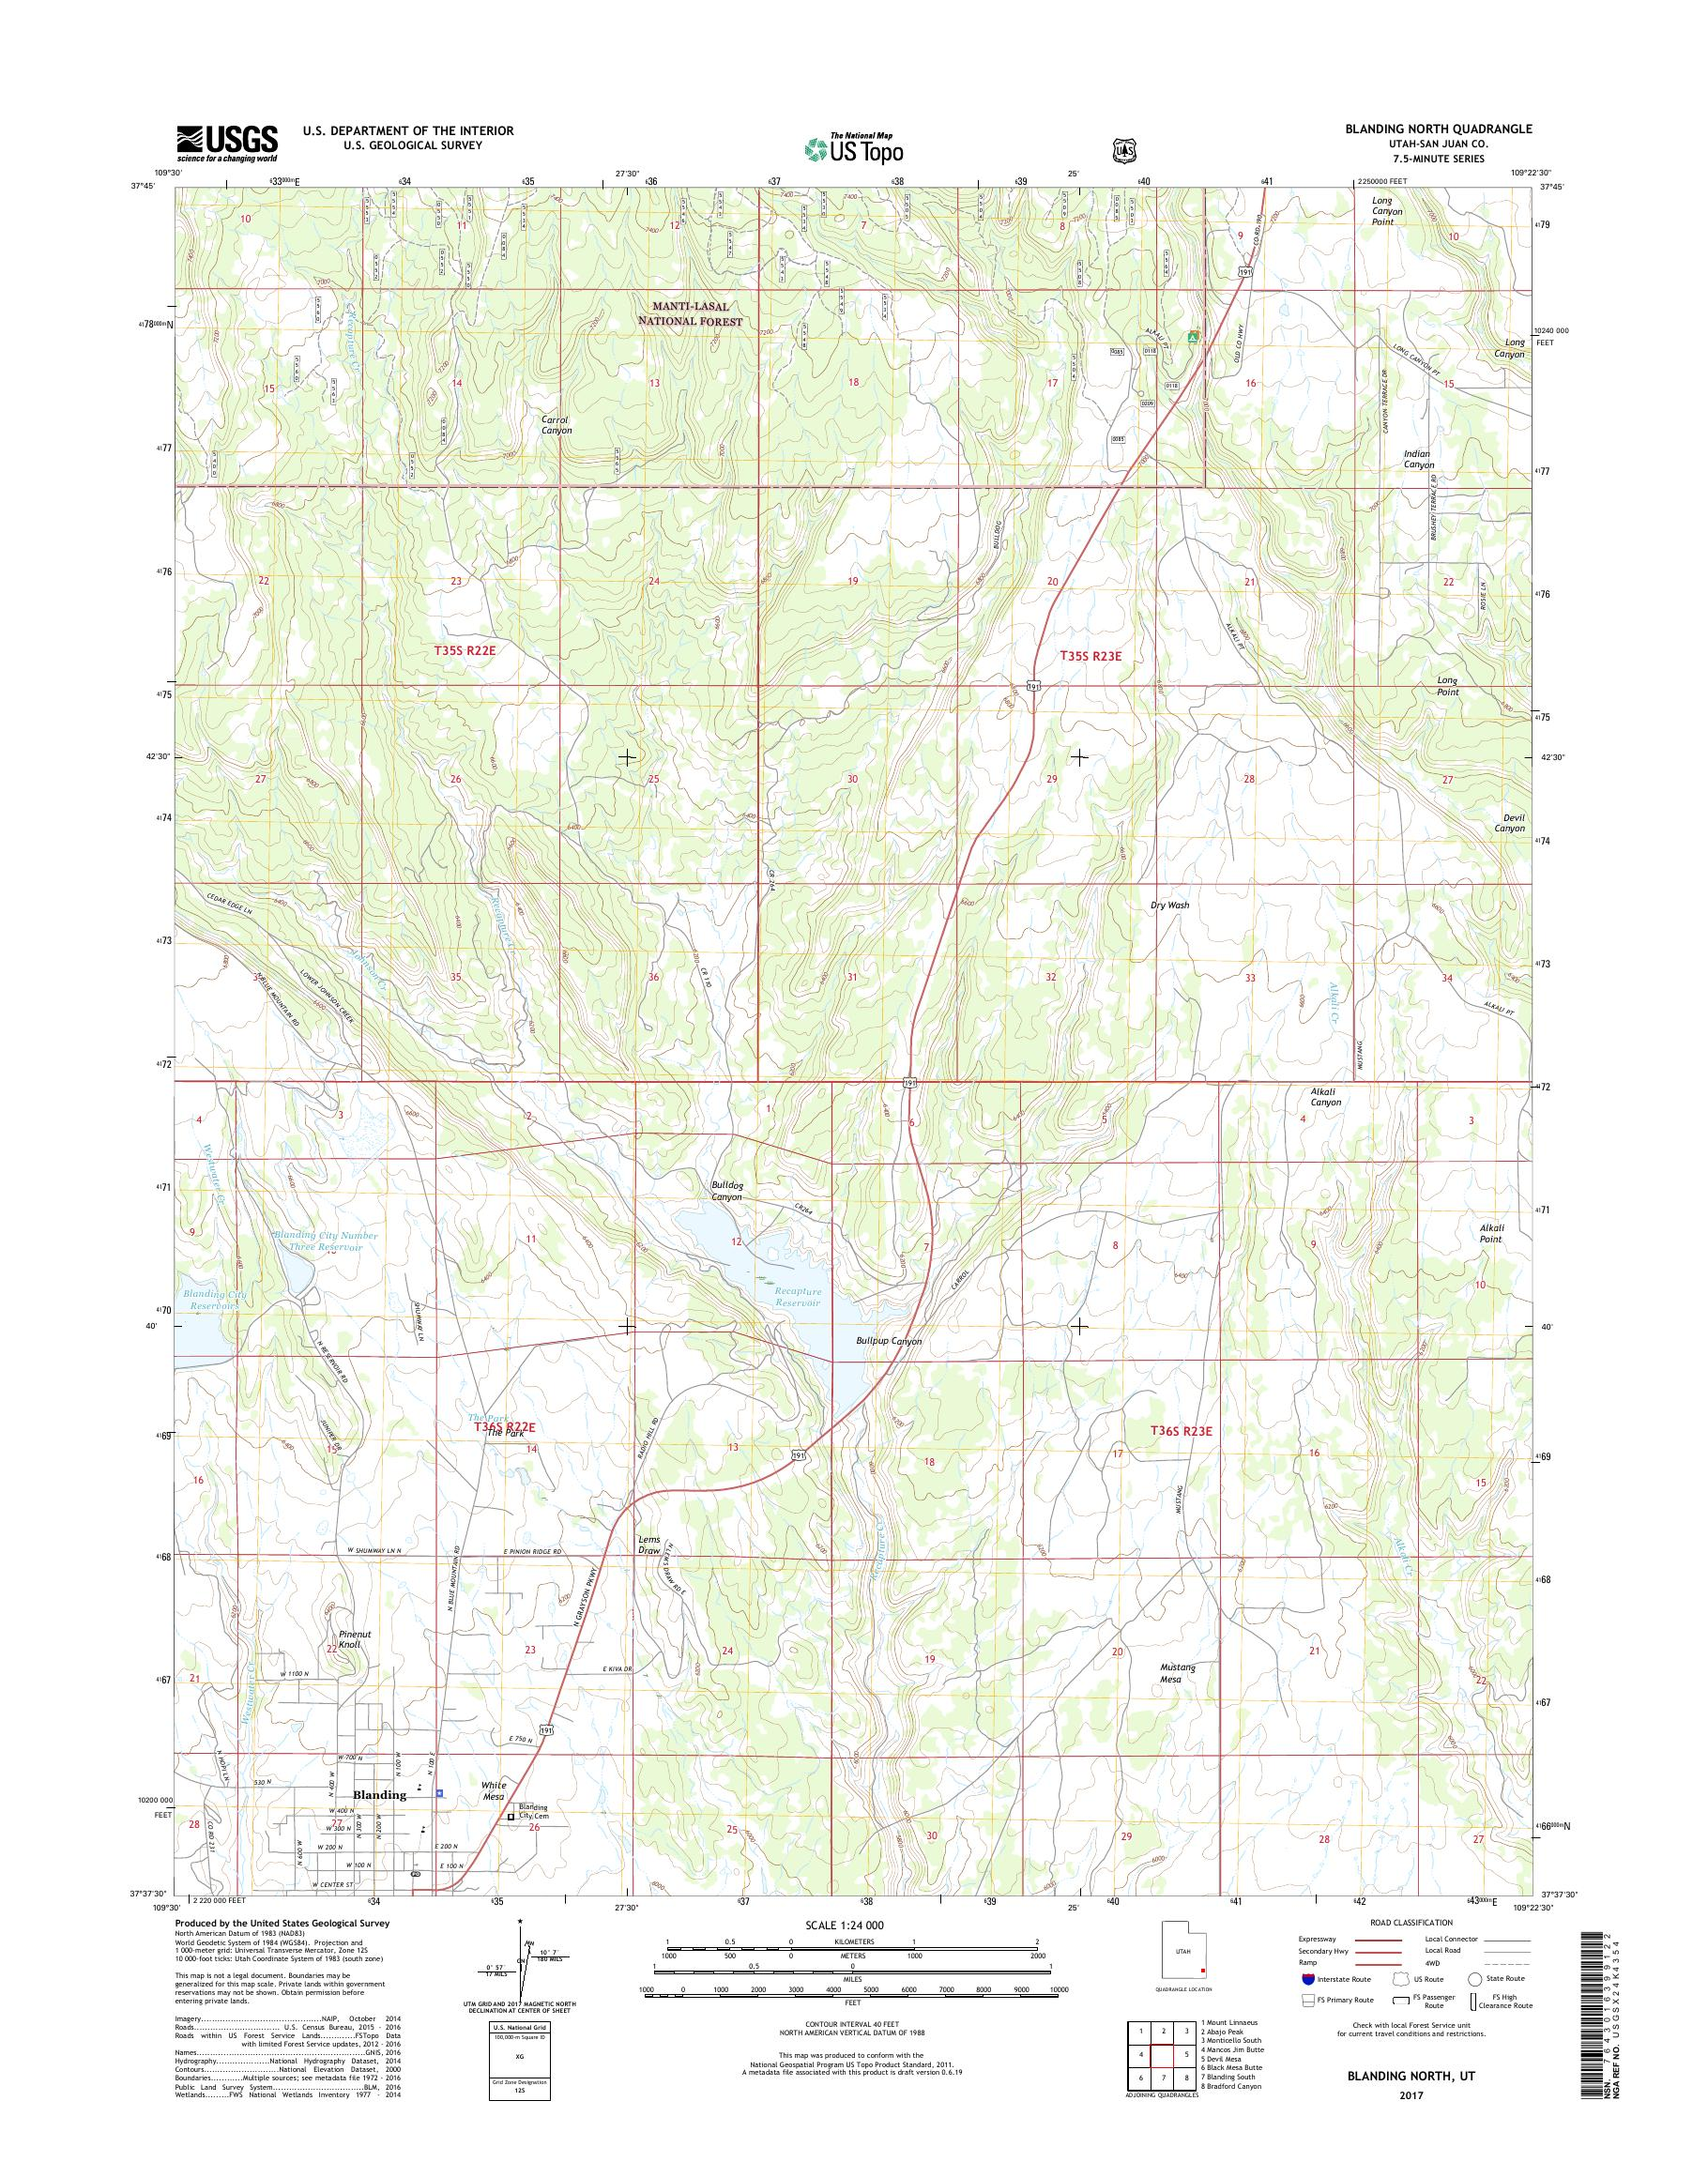 MyTopo Blanding North, Utah USGS Quad Topo Map